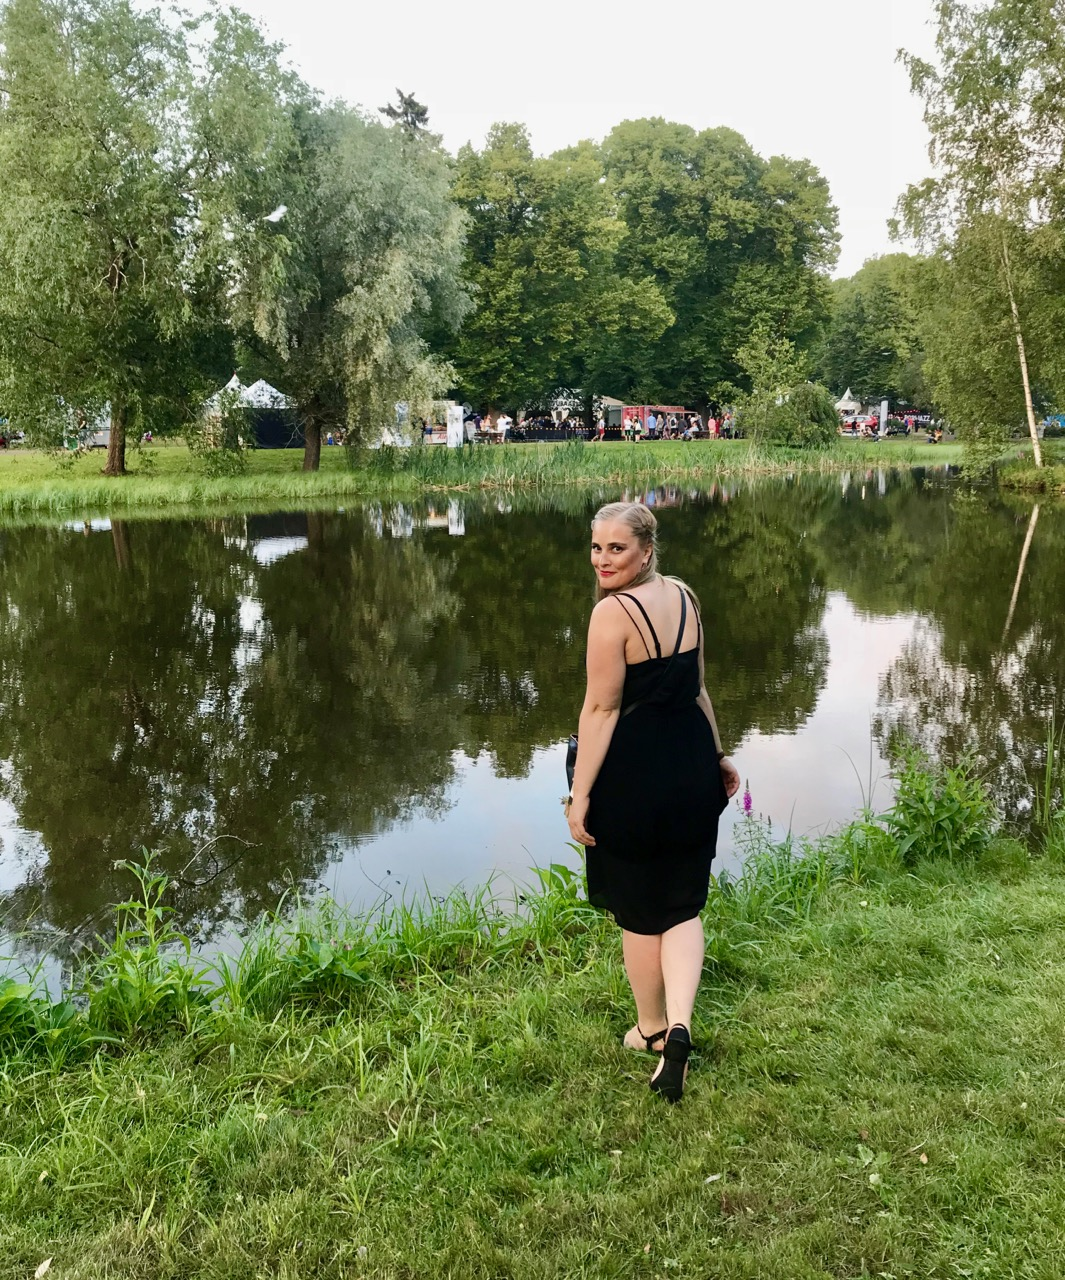 Kotimaanmatkailun vinkit – Pori, Raahe, Kalajoki ja Strömfors